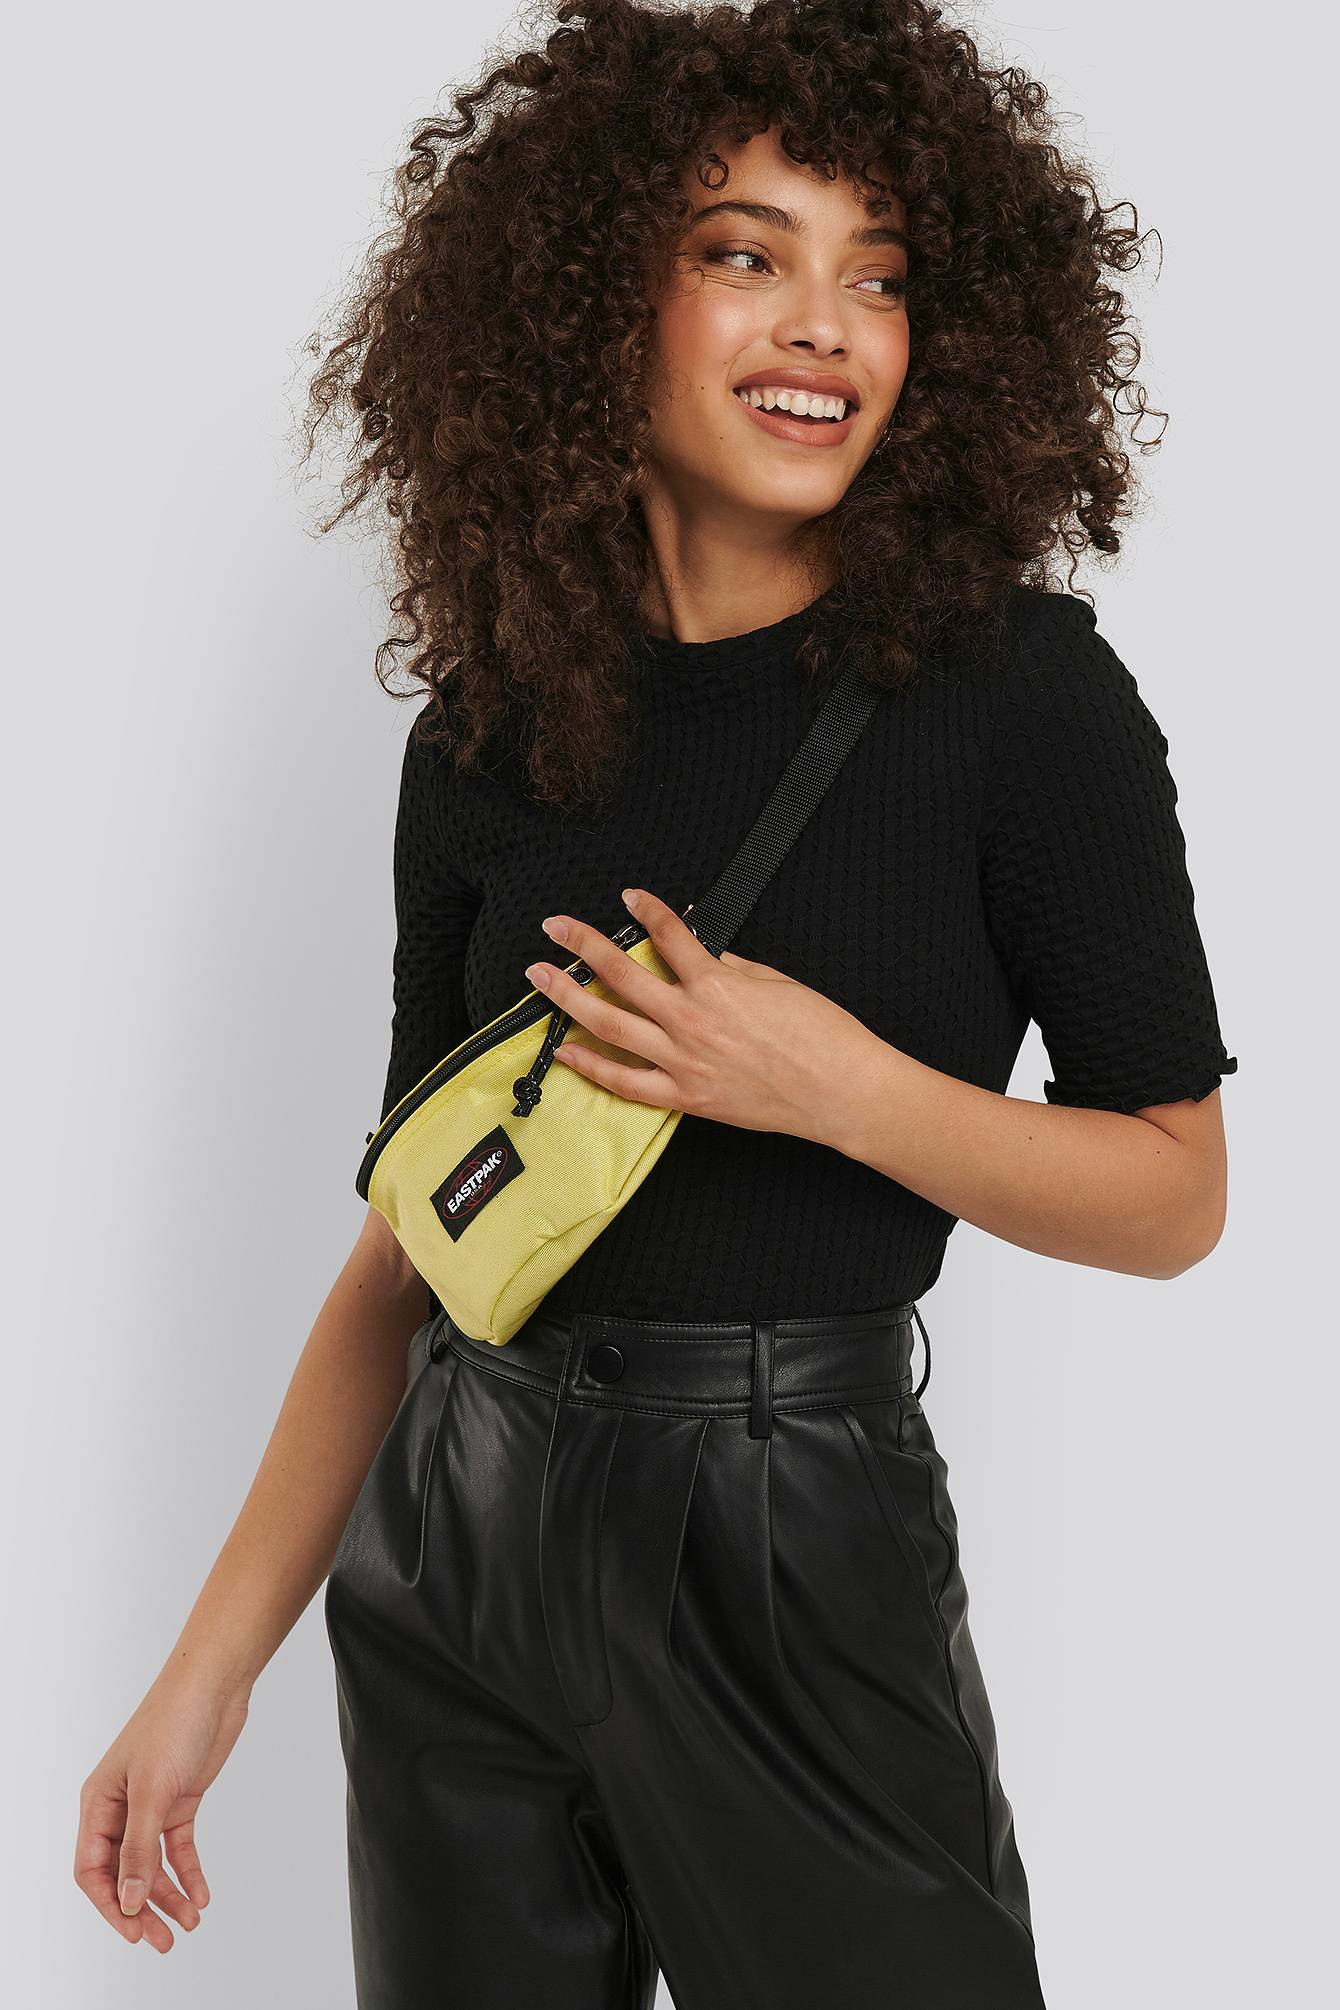 Eastpak Springer Bag - Yellow  - Size: One Size